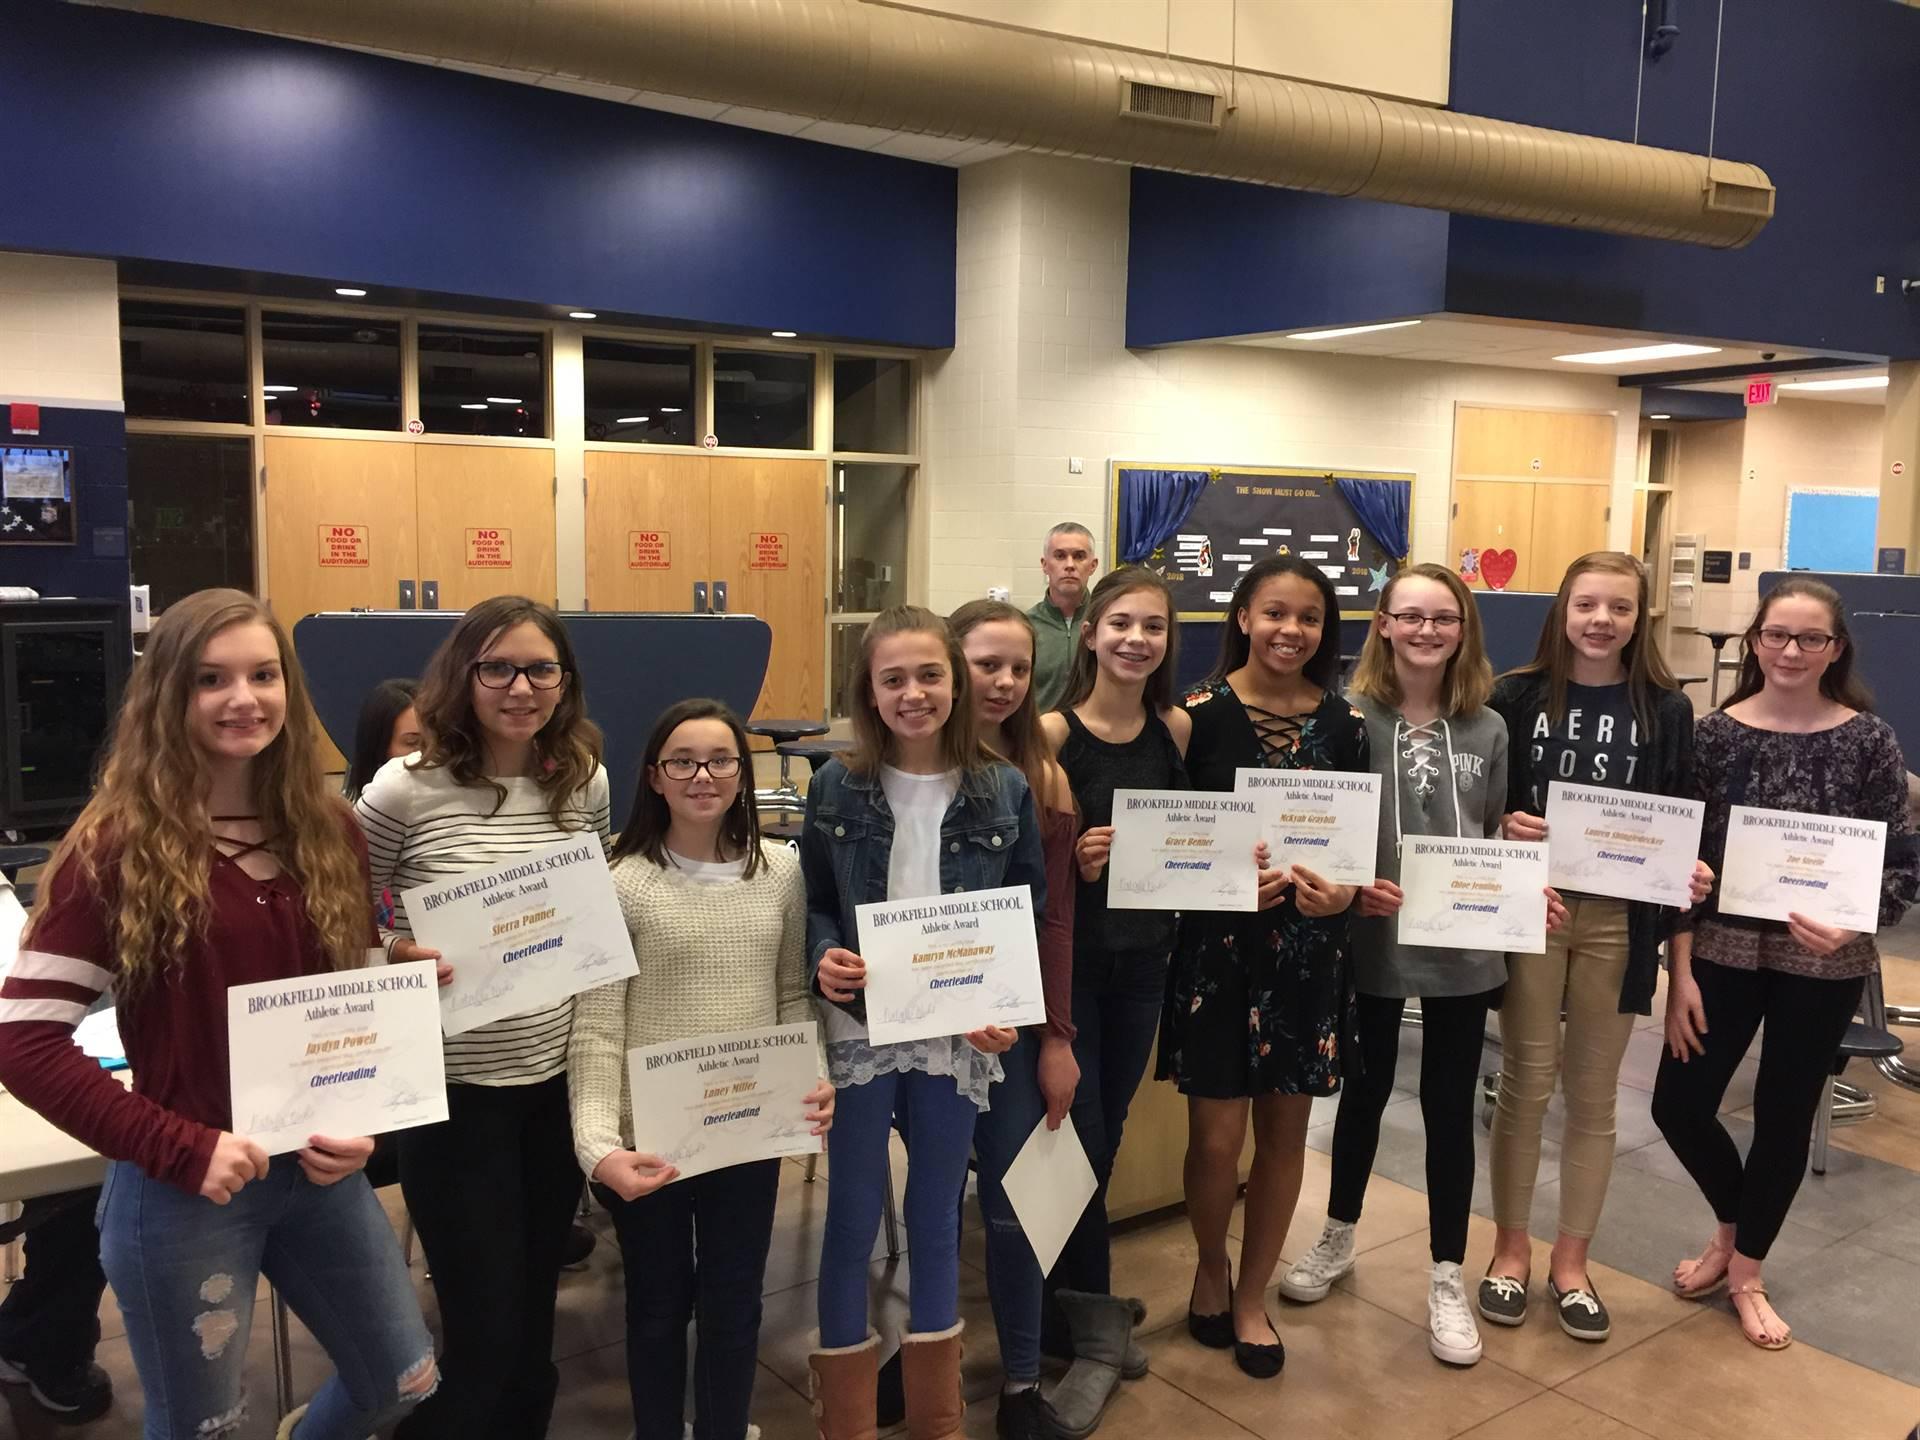 2017-2018 7th Grade Cheerleaders